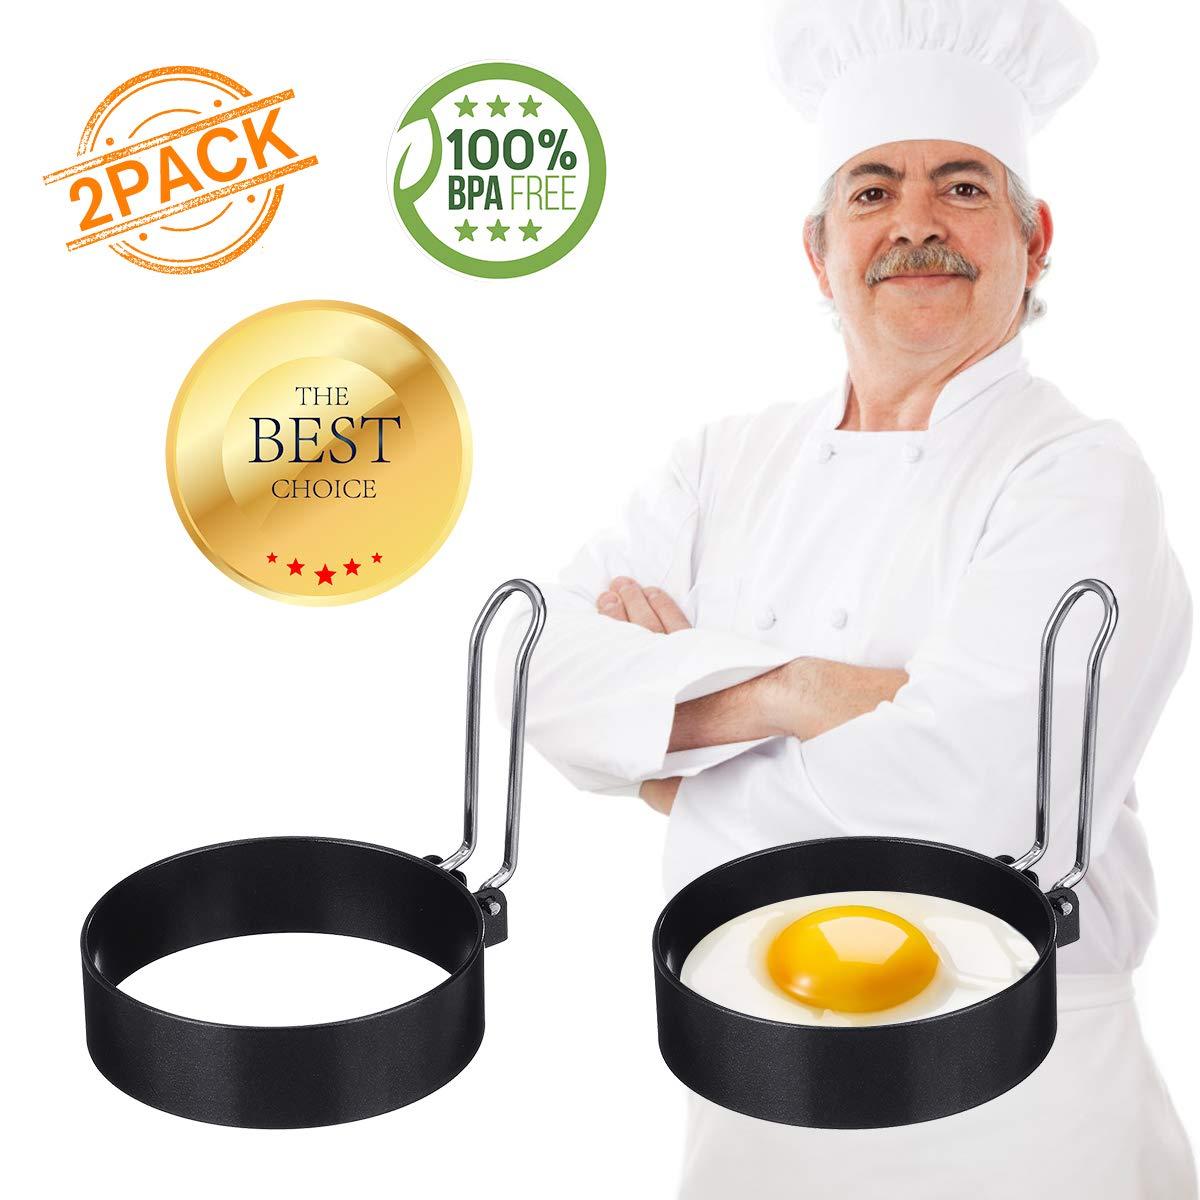 Egg Ring, ARTISTORE 2 Pack Round Egg Pancake Maker Mold, Stainless Steel Non Stick Metal Circle Shaper Mold, Household Kitchen Cooking Tool for Frying or Shaping Eggs, Egg Maker 3 Inch. Best gift for